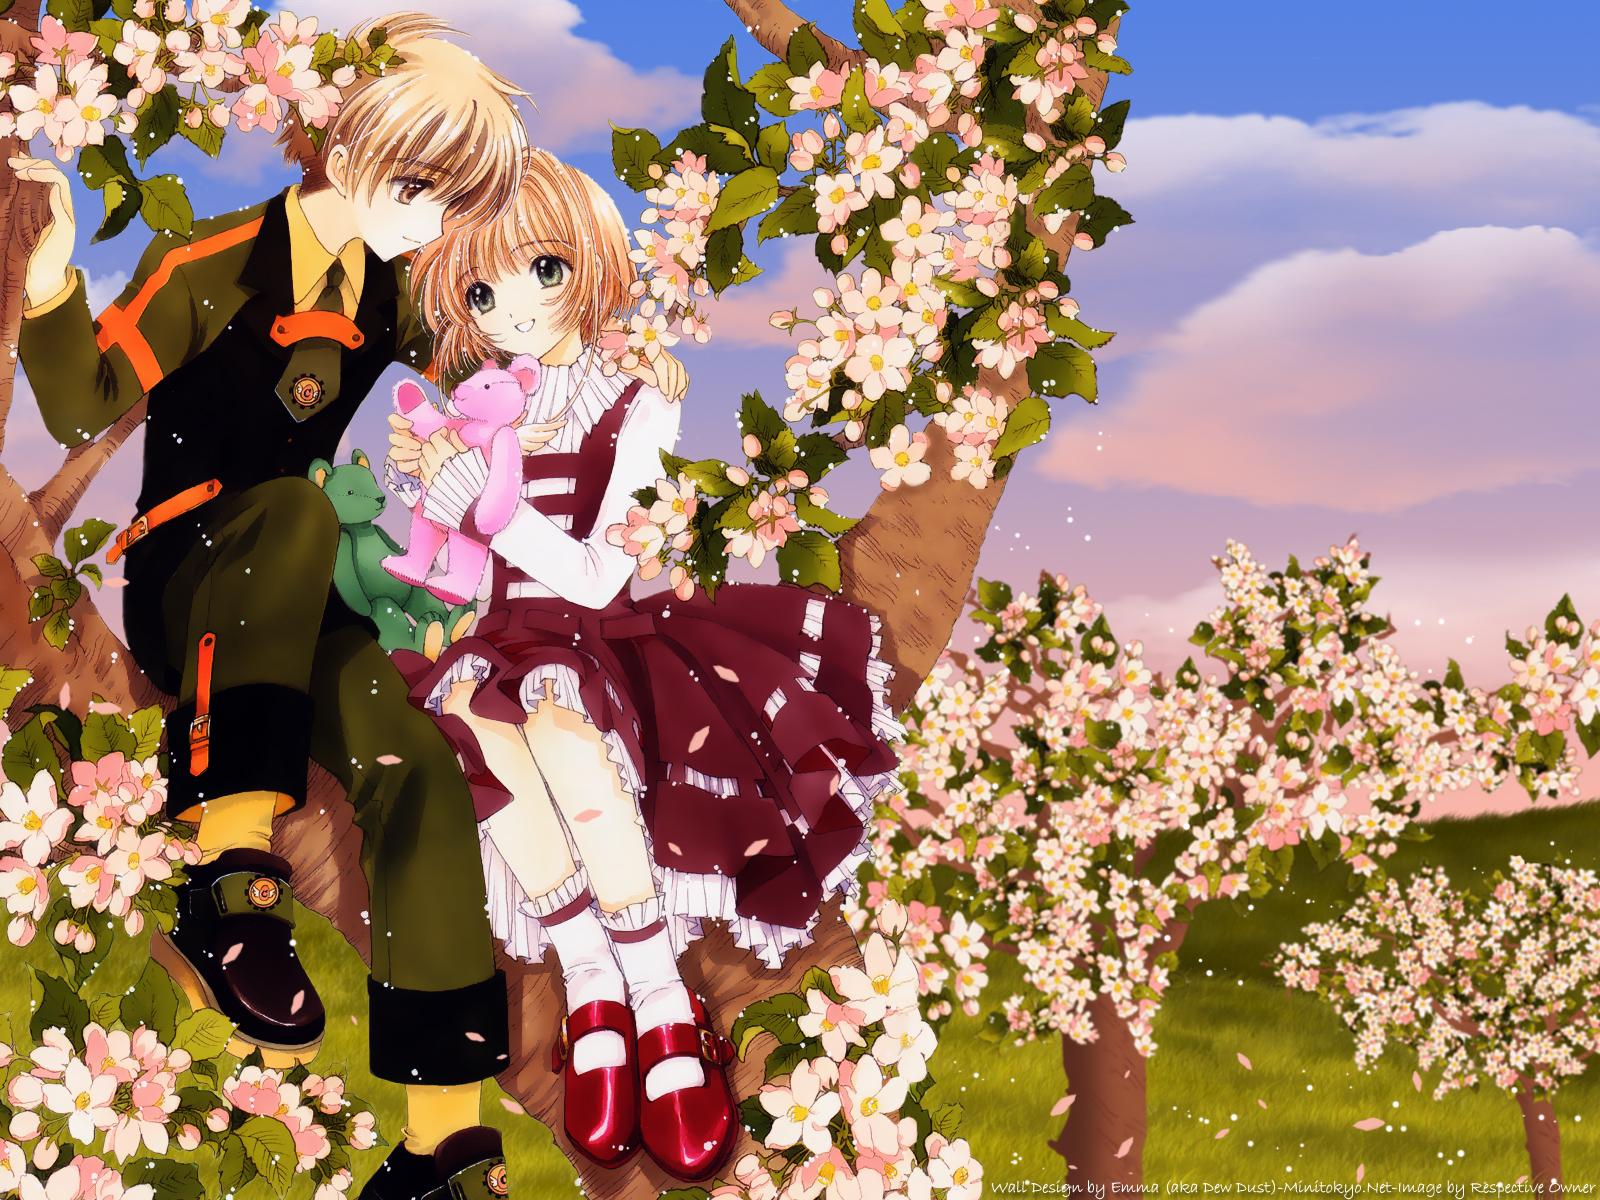 brown_hair card_captor_sakura clamp flowers kinomoto_sakura li_syaoran petals teddy_bear tree